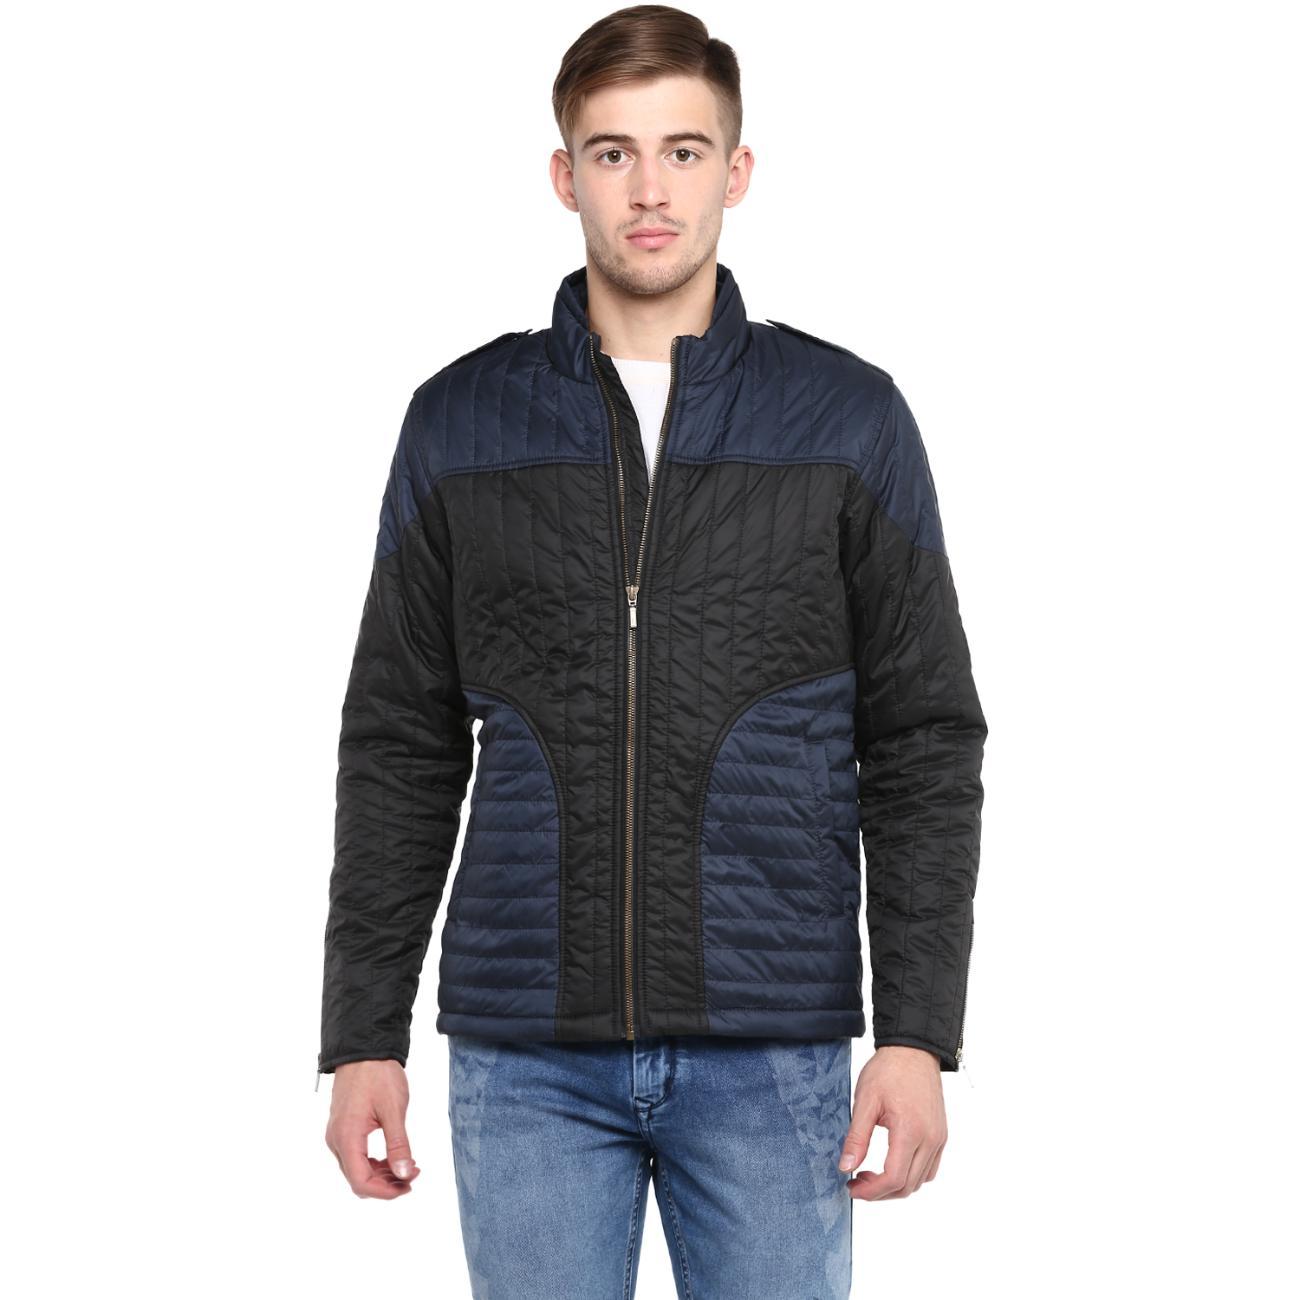 Buy Black Navy Jacket for Men